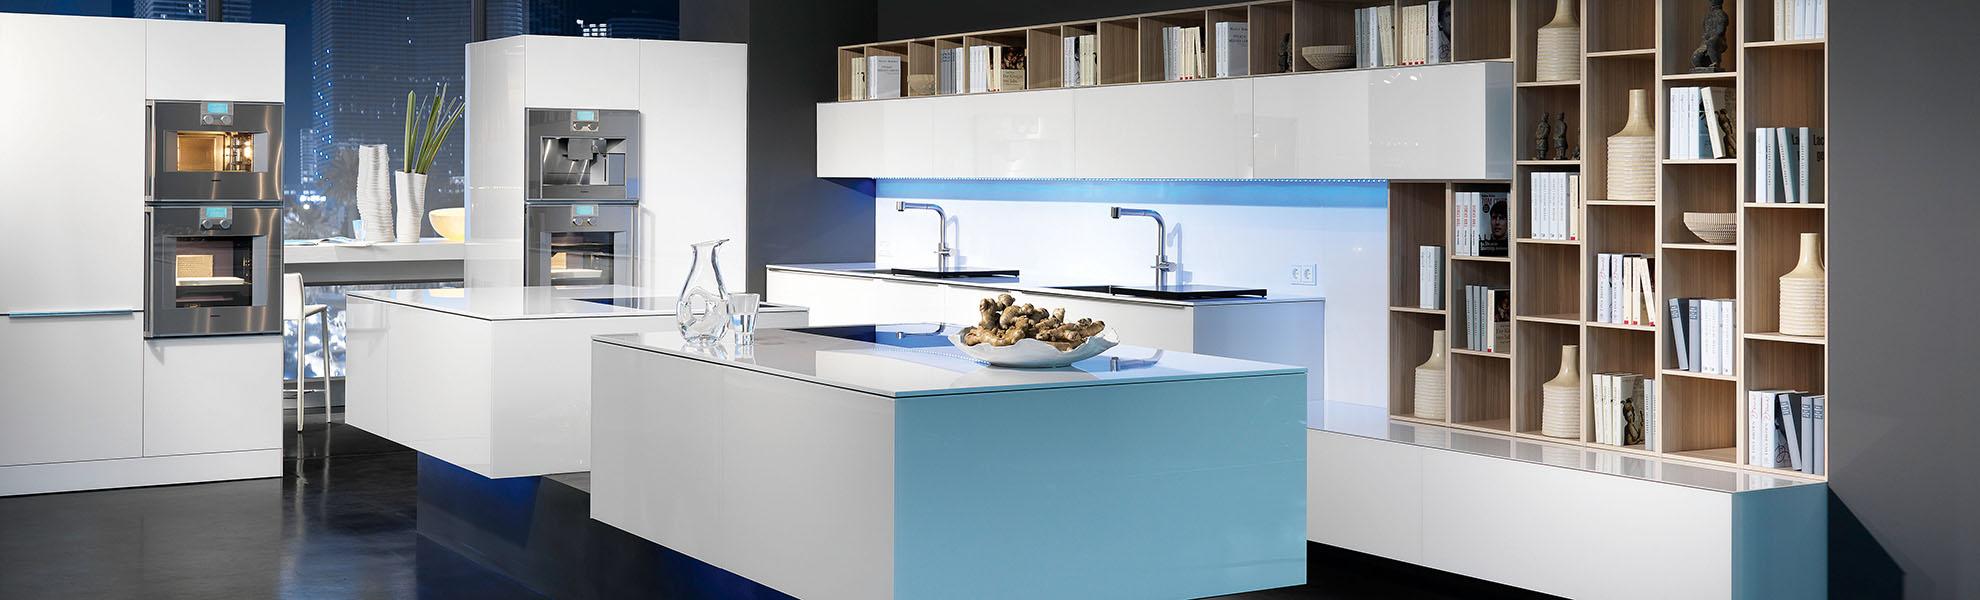 rational nolte nobilia bauformat k chen am hopfenmarkt. Black Bedroom Furniture Sets. Home Design Ideas